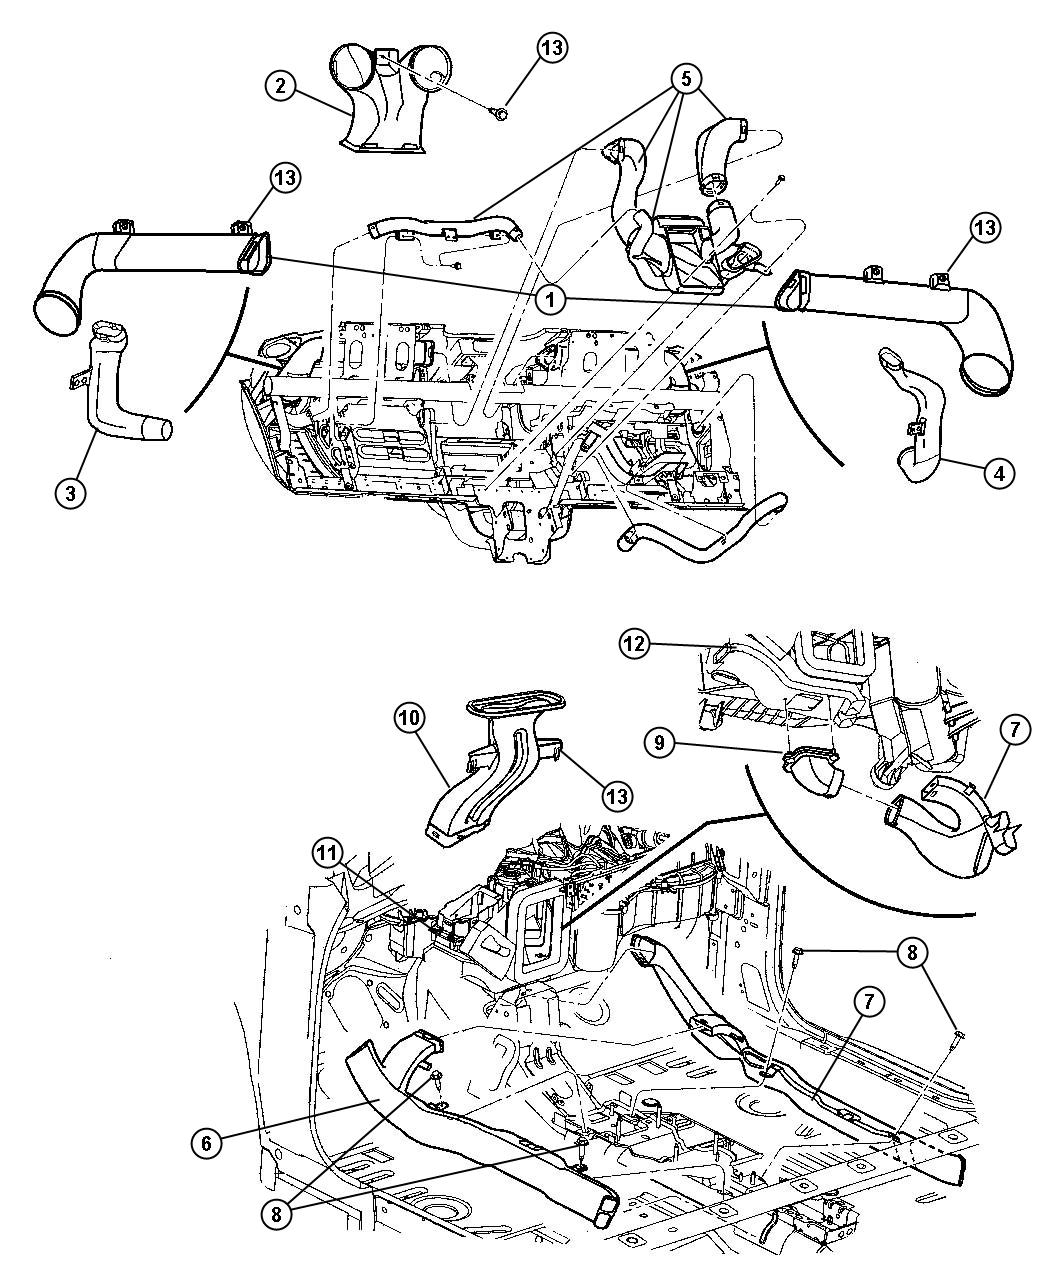 Chrysler Pt Cruiser Screw Hex Flange Head M4 2x1 70x15